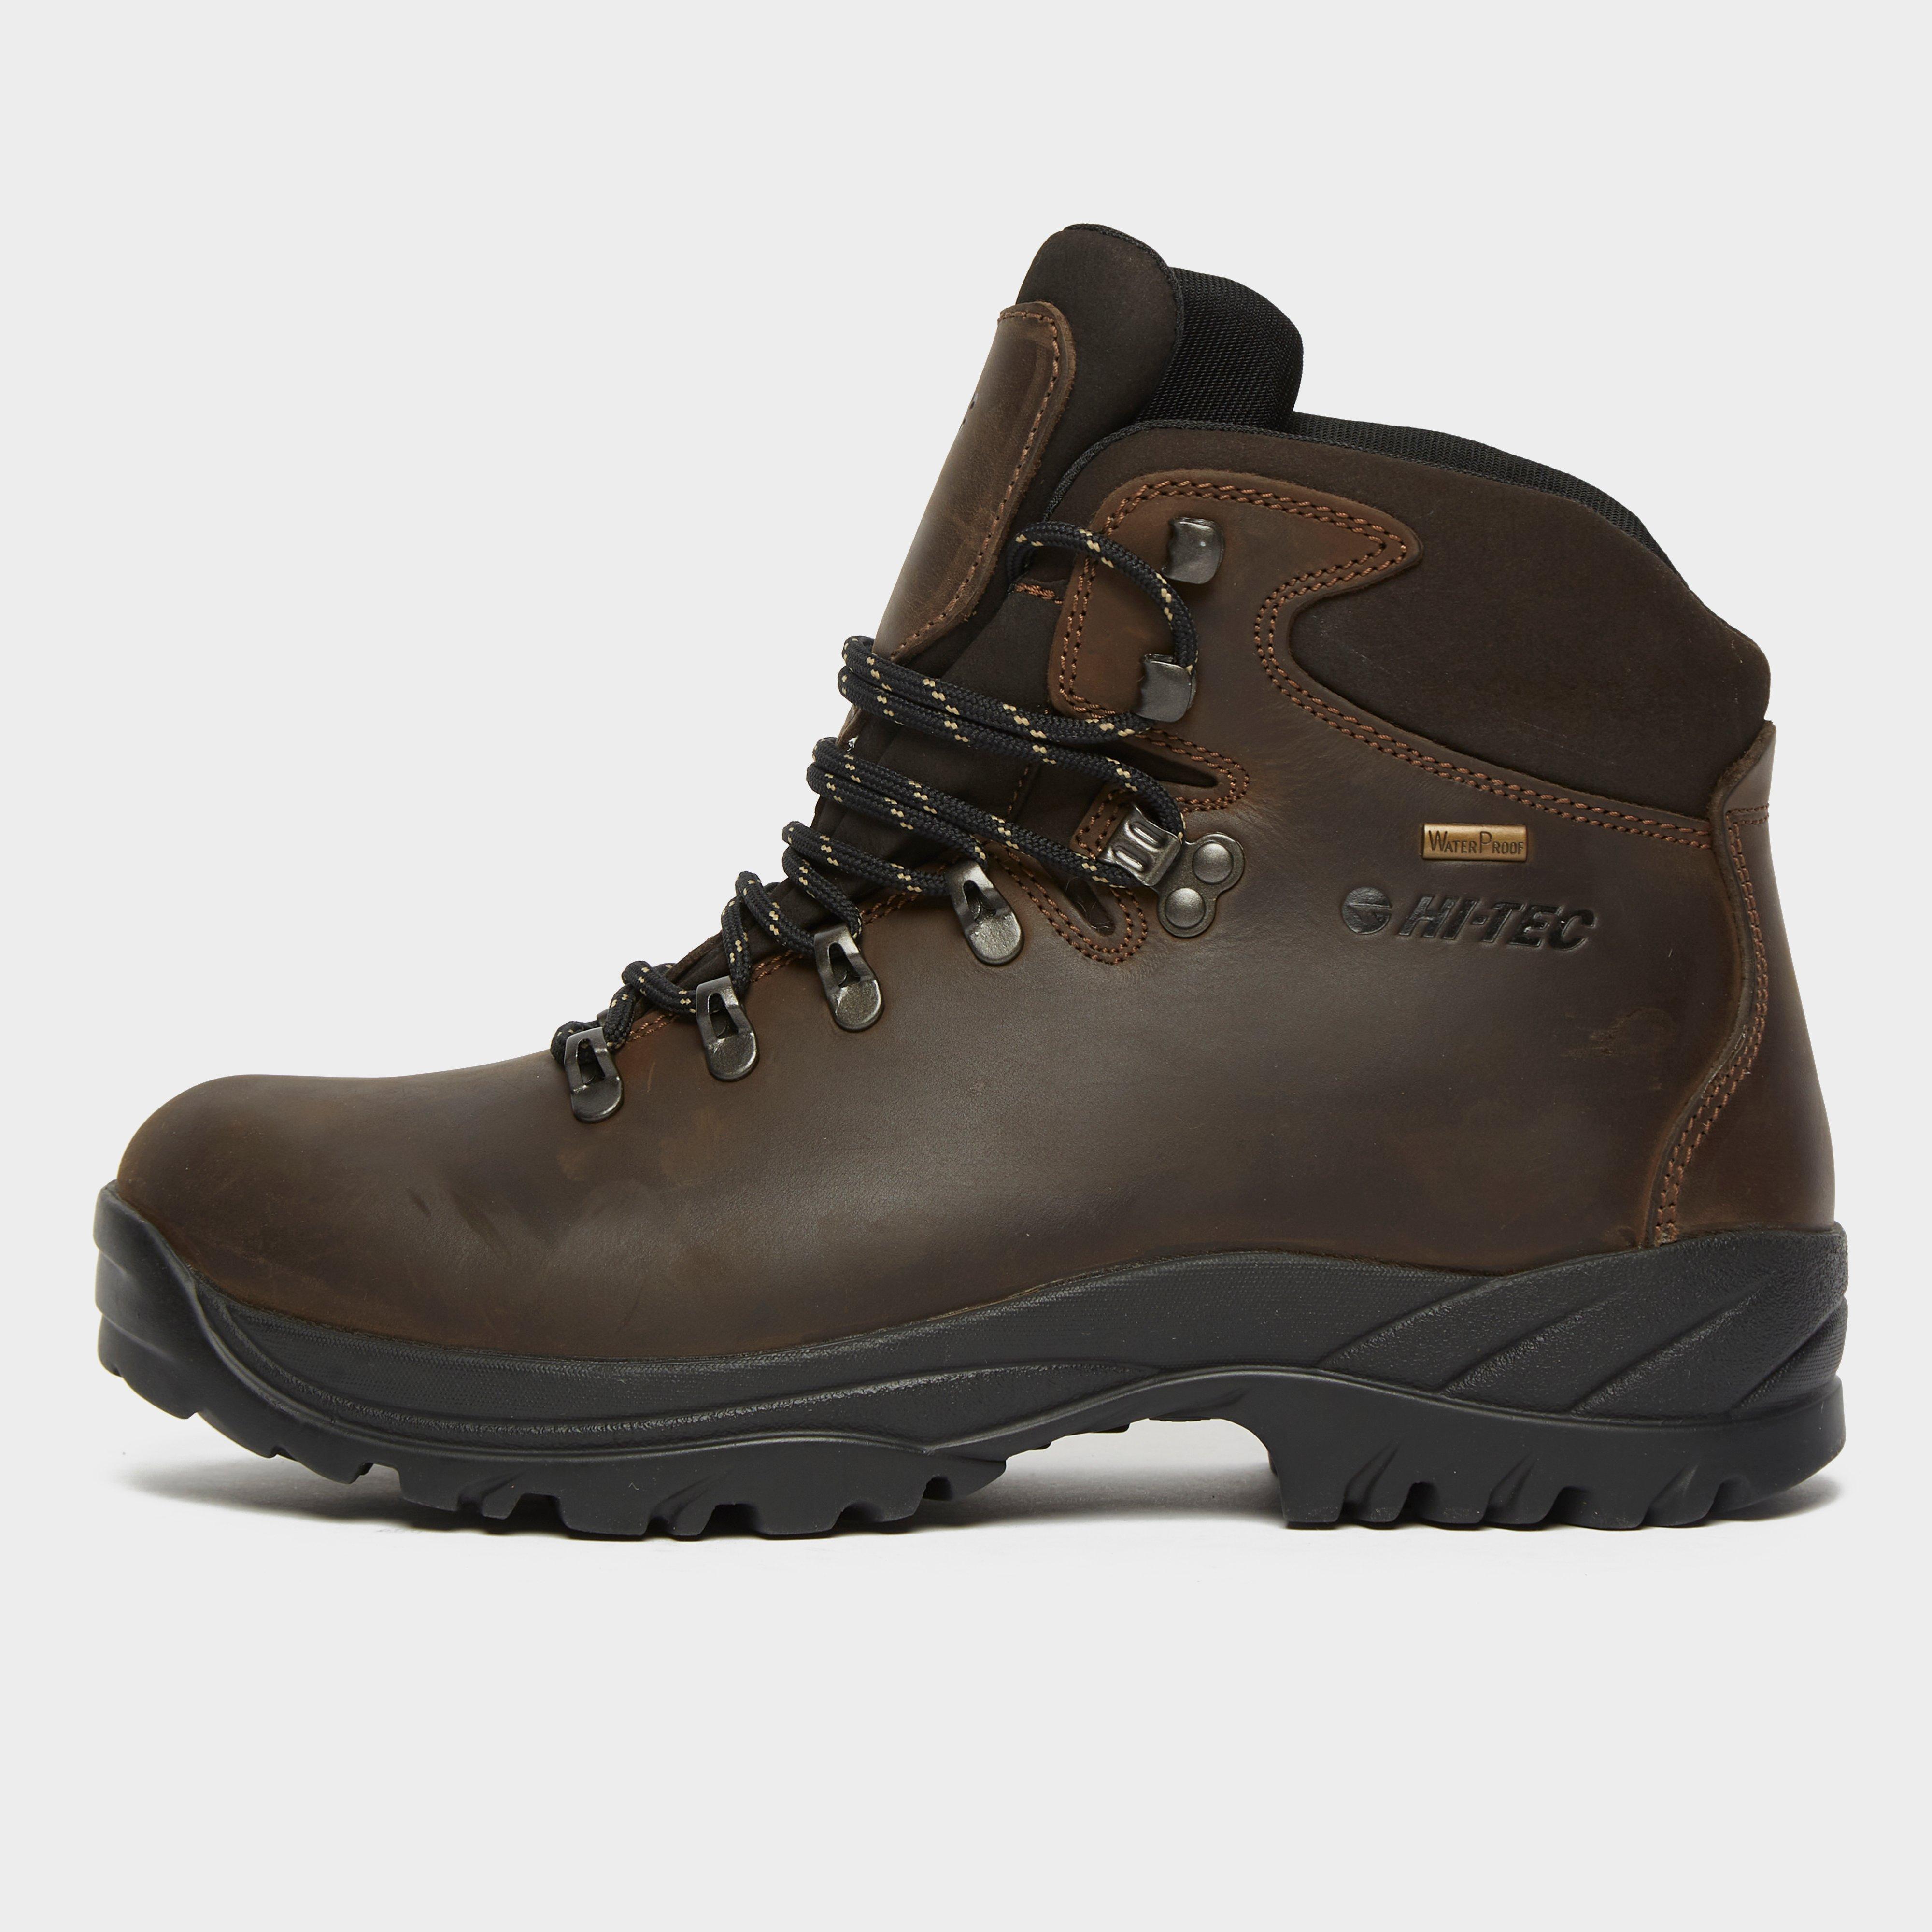 Hi Tec Hi Tec Mens Summit Waterproof Hiking Boots, Brown